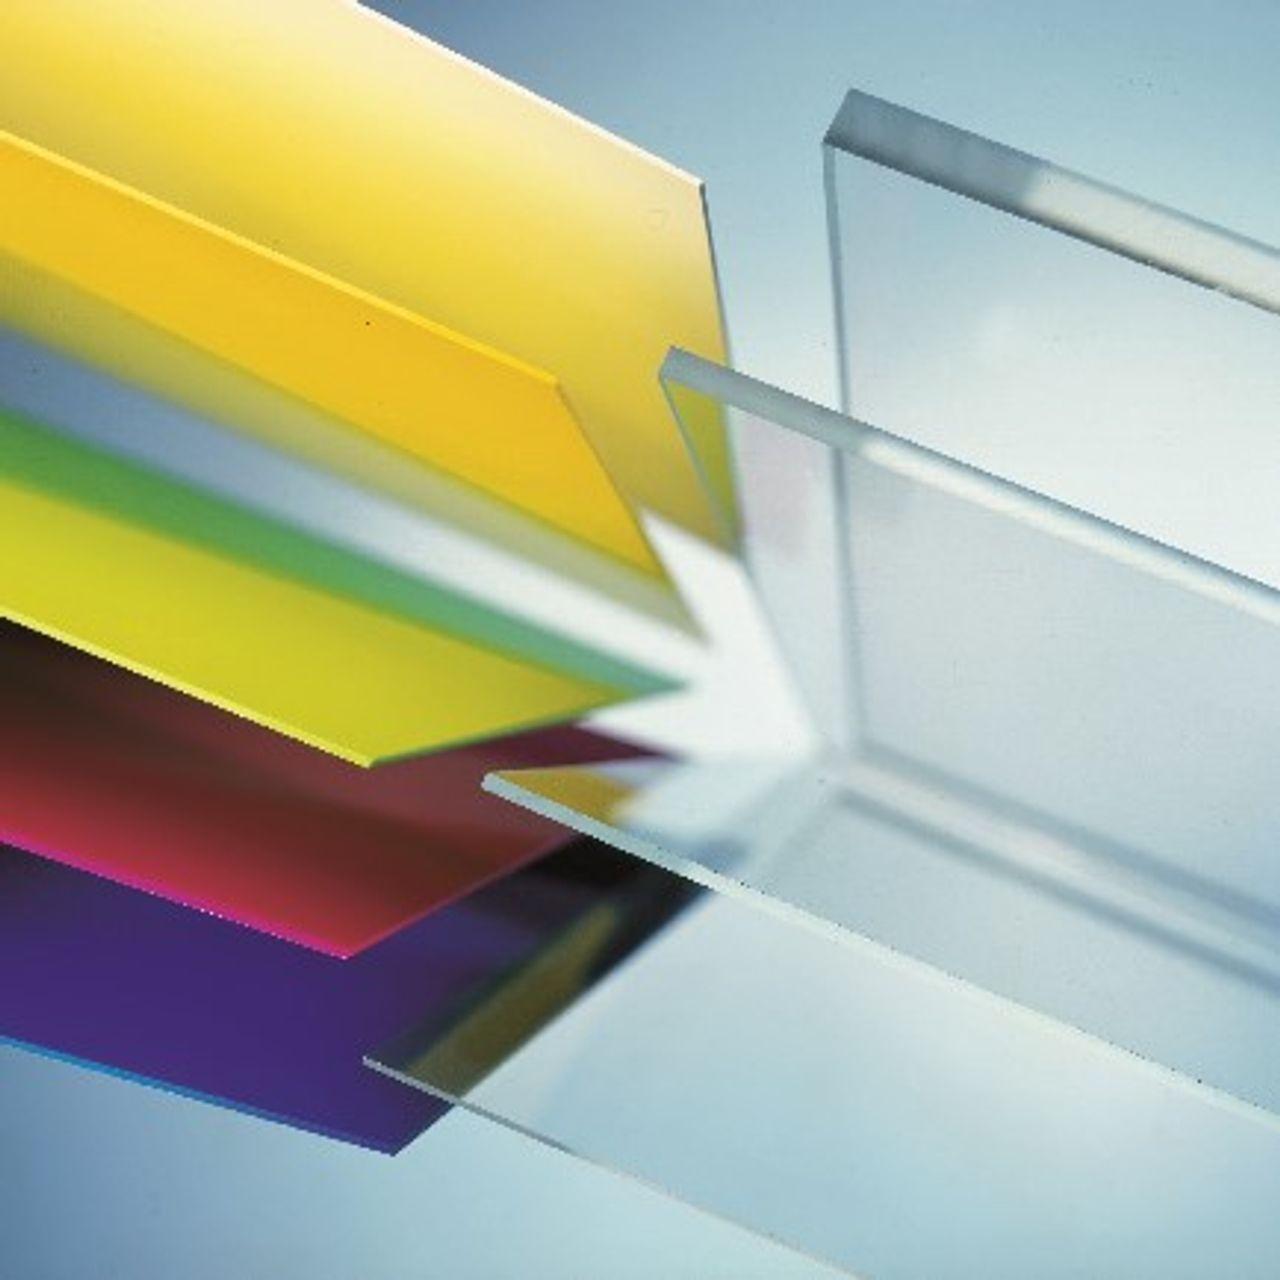 thyssenkrupp kunststof perspex plexiglas acrylaat staven